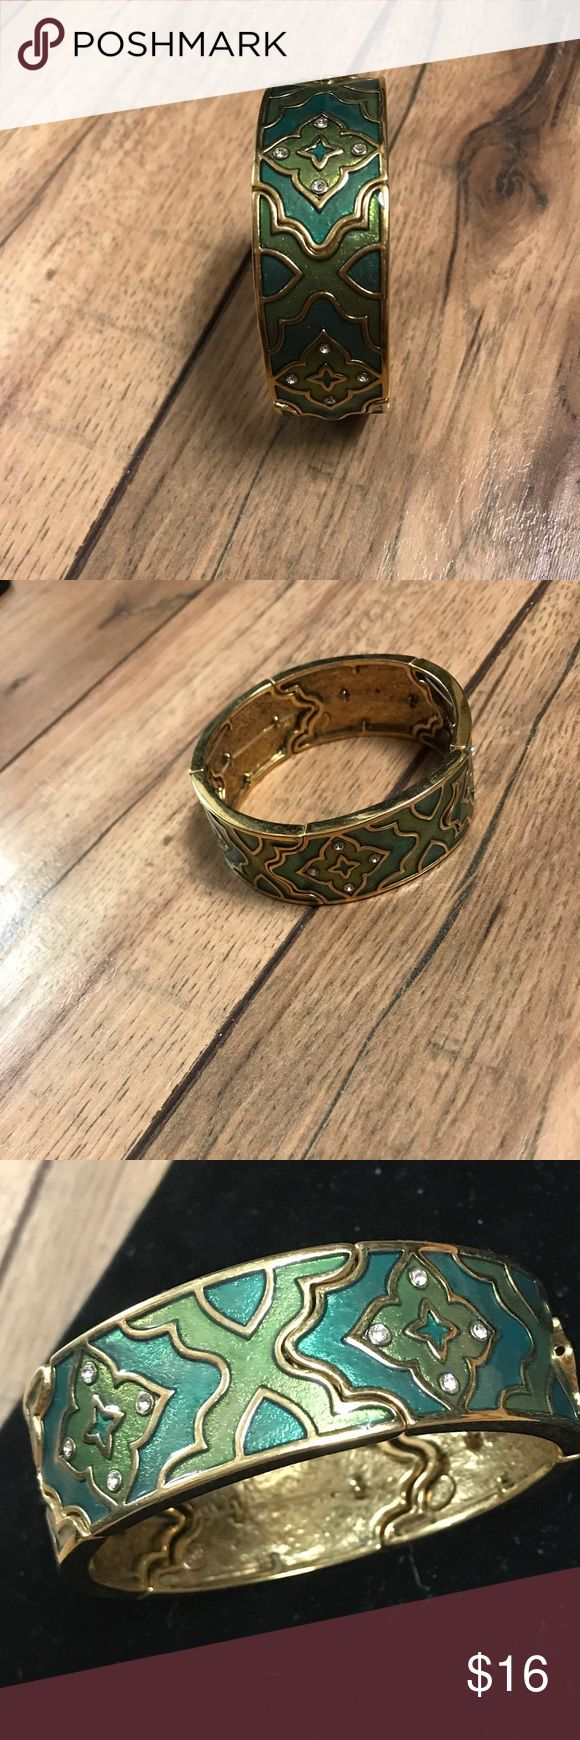 "Premier Designs ""Arabesque"" Stretch Bracelet Premier Designs ""Arabesque"" Stretch Bracelet.  Great condition. Antiqued matte gold with green tones. 7 1/2 inch stretch band. Premier Designs Jewelry Bracelets"